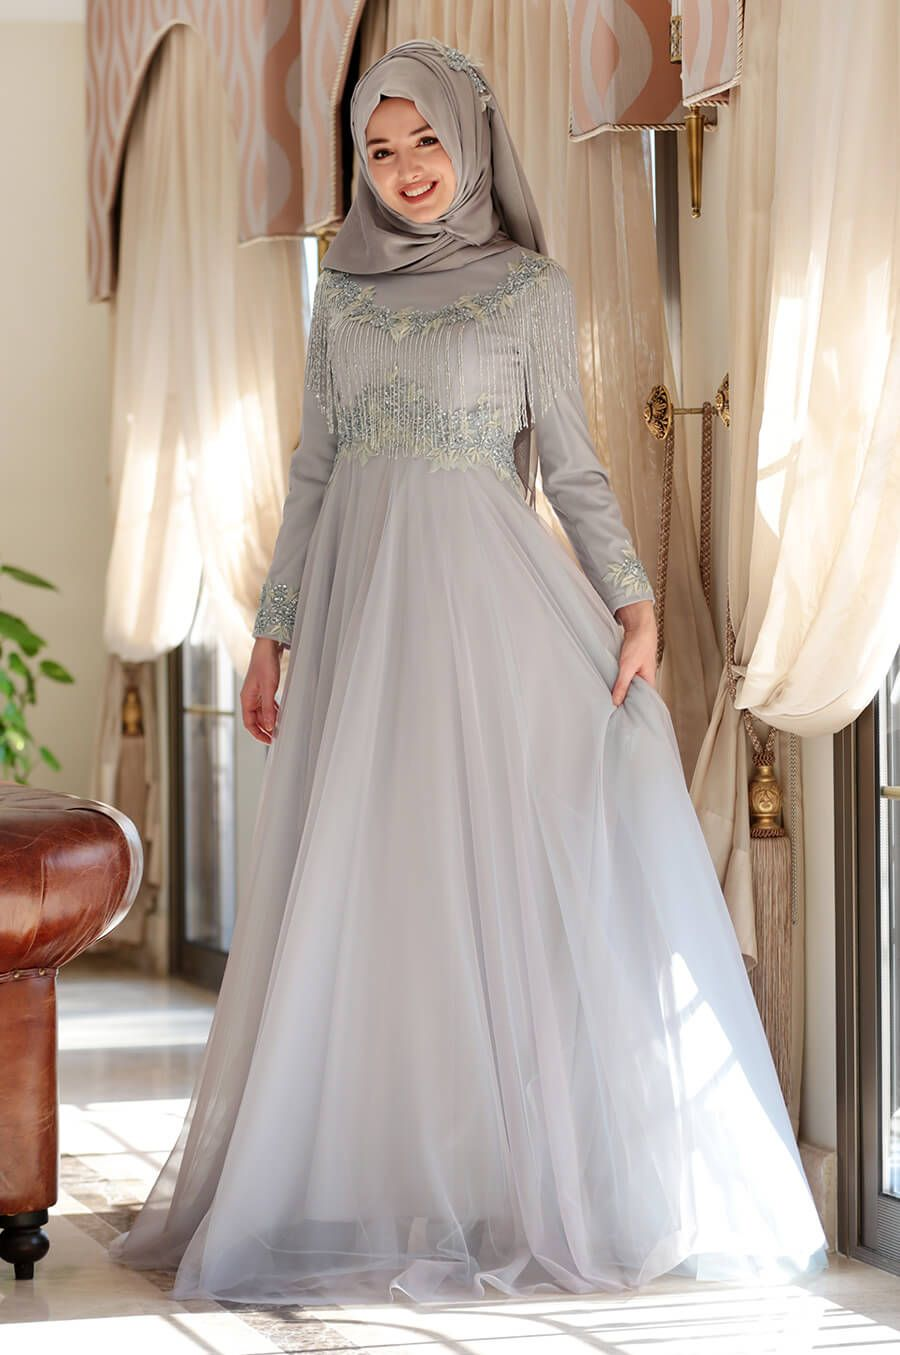 2018 Gamze Ozkul Abiye Elbise Modelleri In 2020 Hijab Chic Long Sleeve Dress Fashion